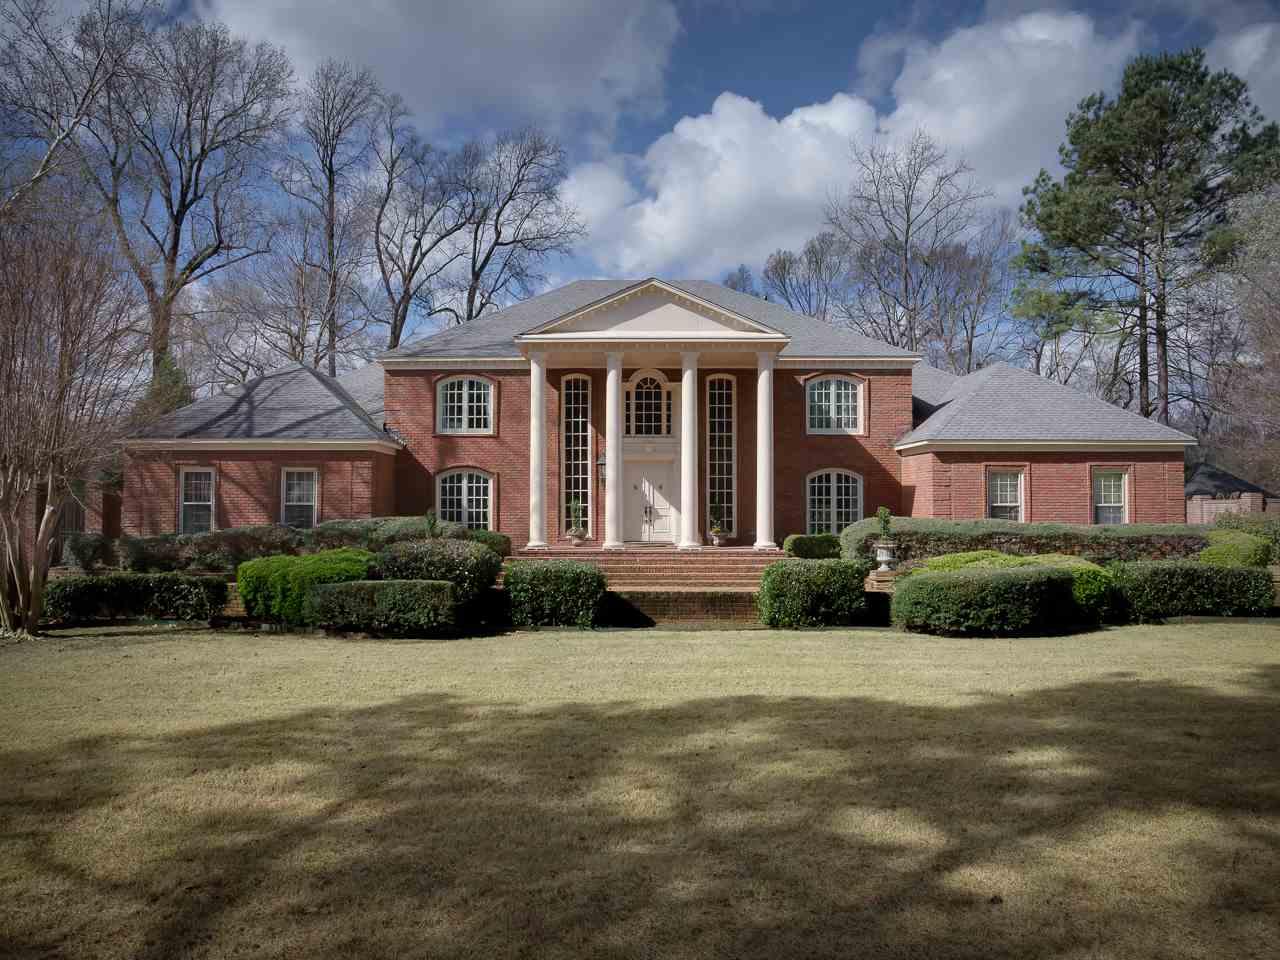 393 SWEETBRIER RD, Memphis, TN 38120